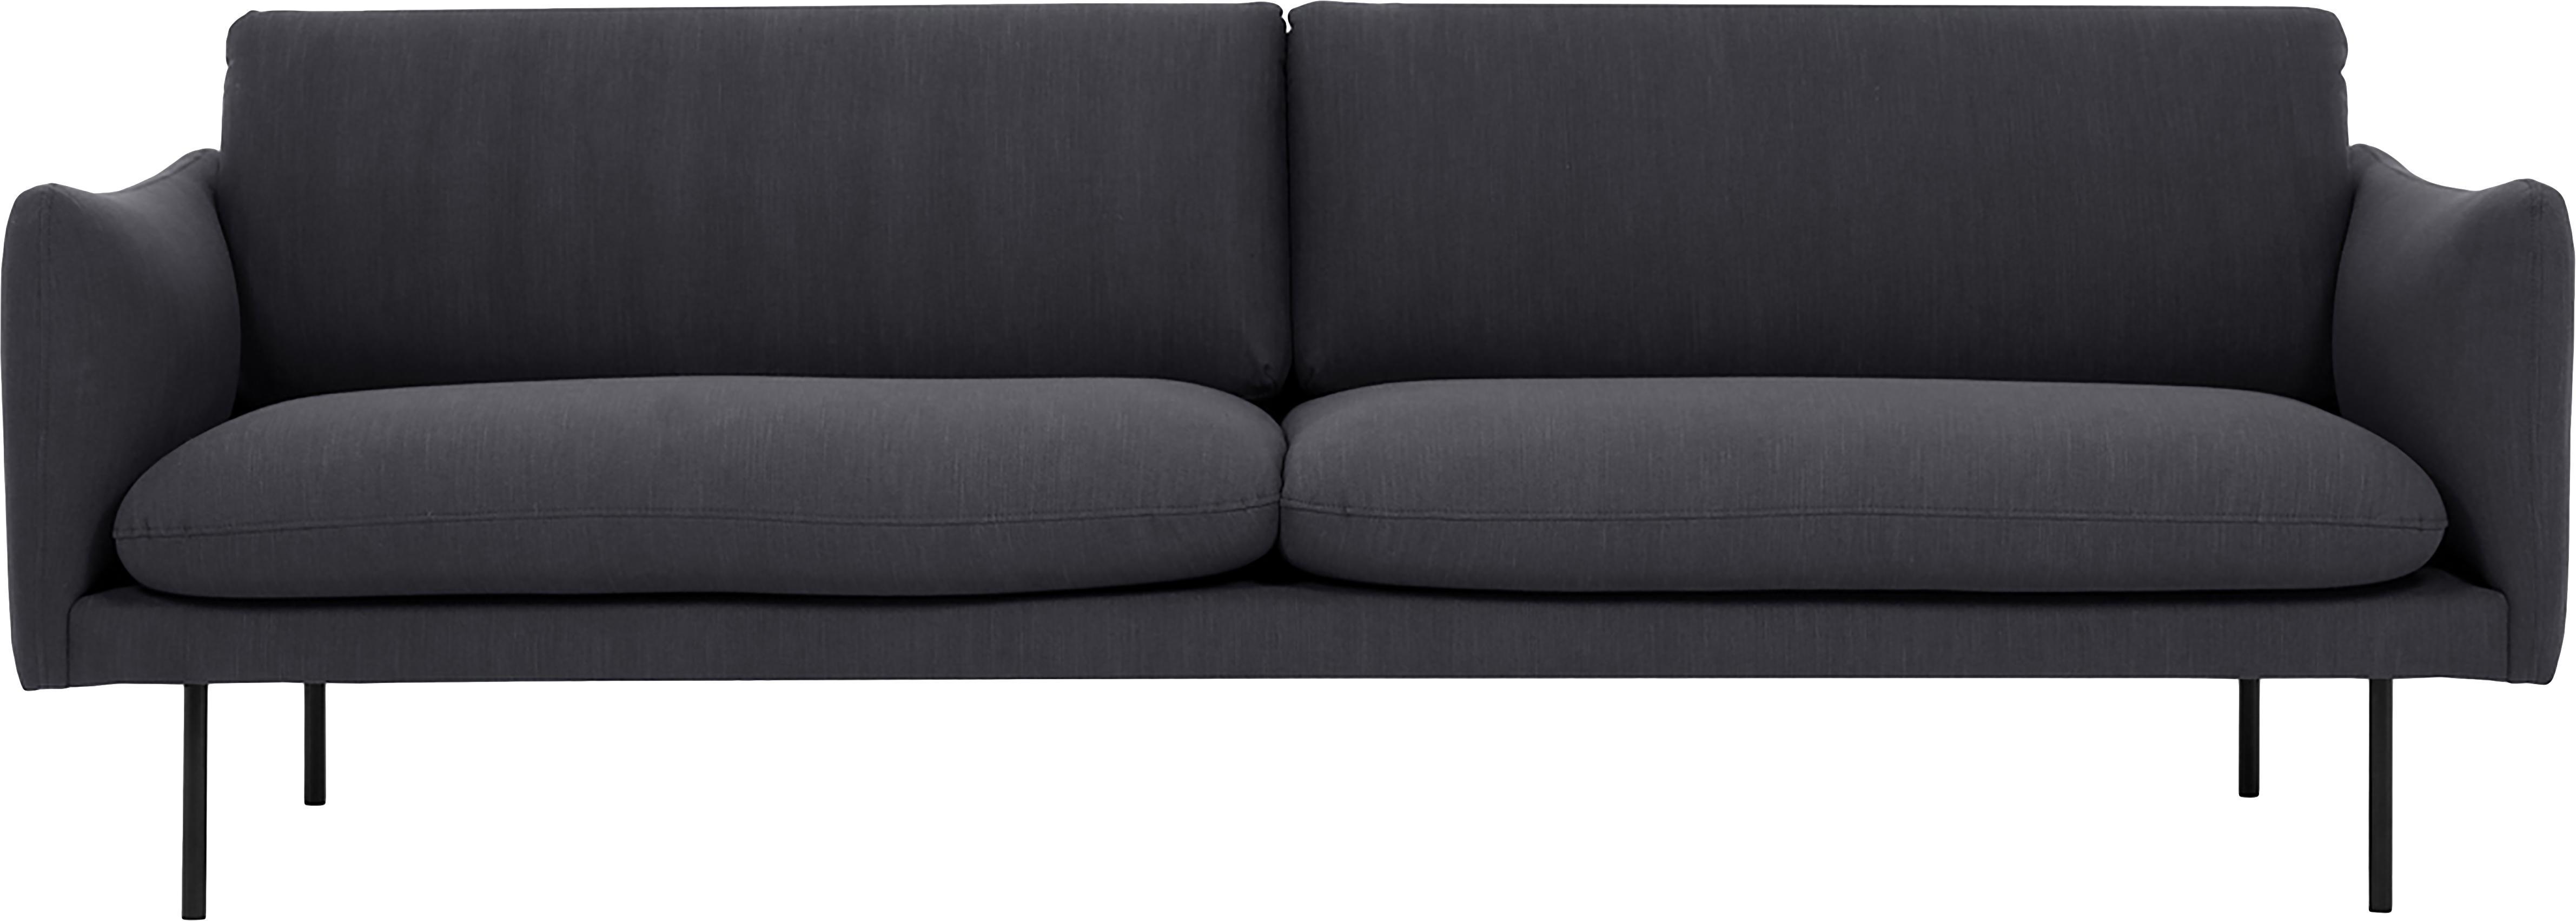 Sofa Moby (3-Sitzer), Bezug: Polyester Der hochwertige, Gestell: Massives Kiefernholz, Füße: Metall, pulverbeschichtet, Webstoff Dunkelgrau, B 220 x T 95 cm